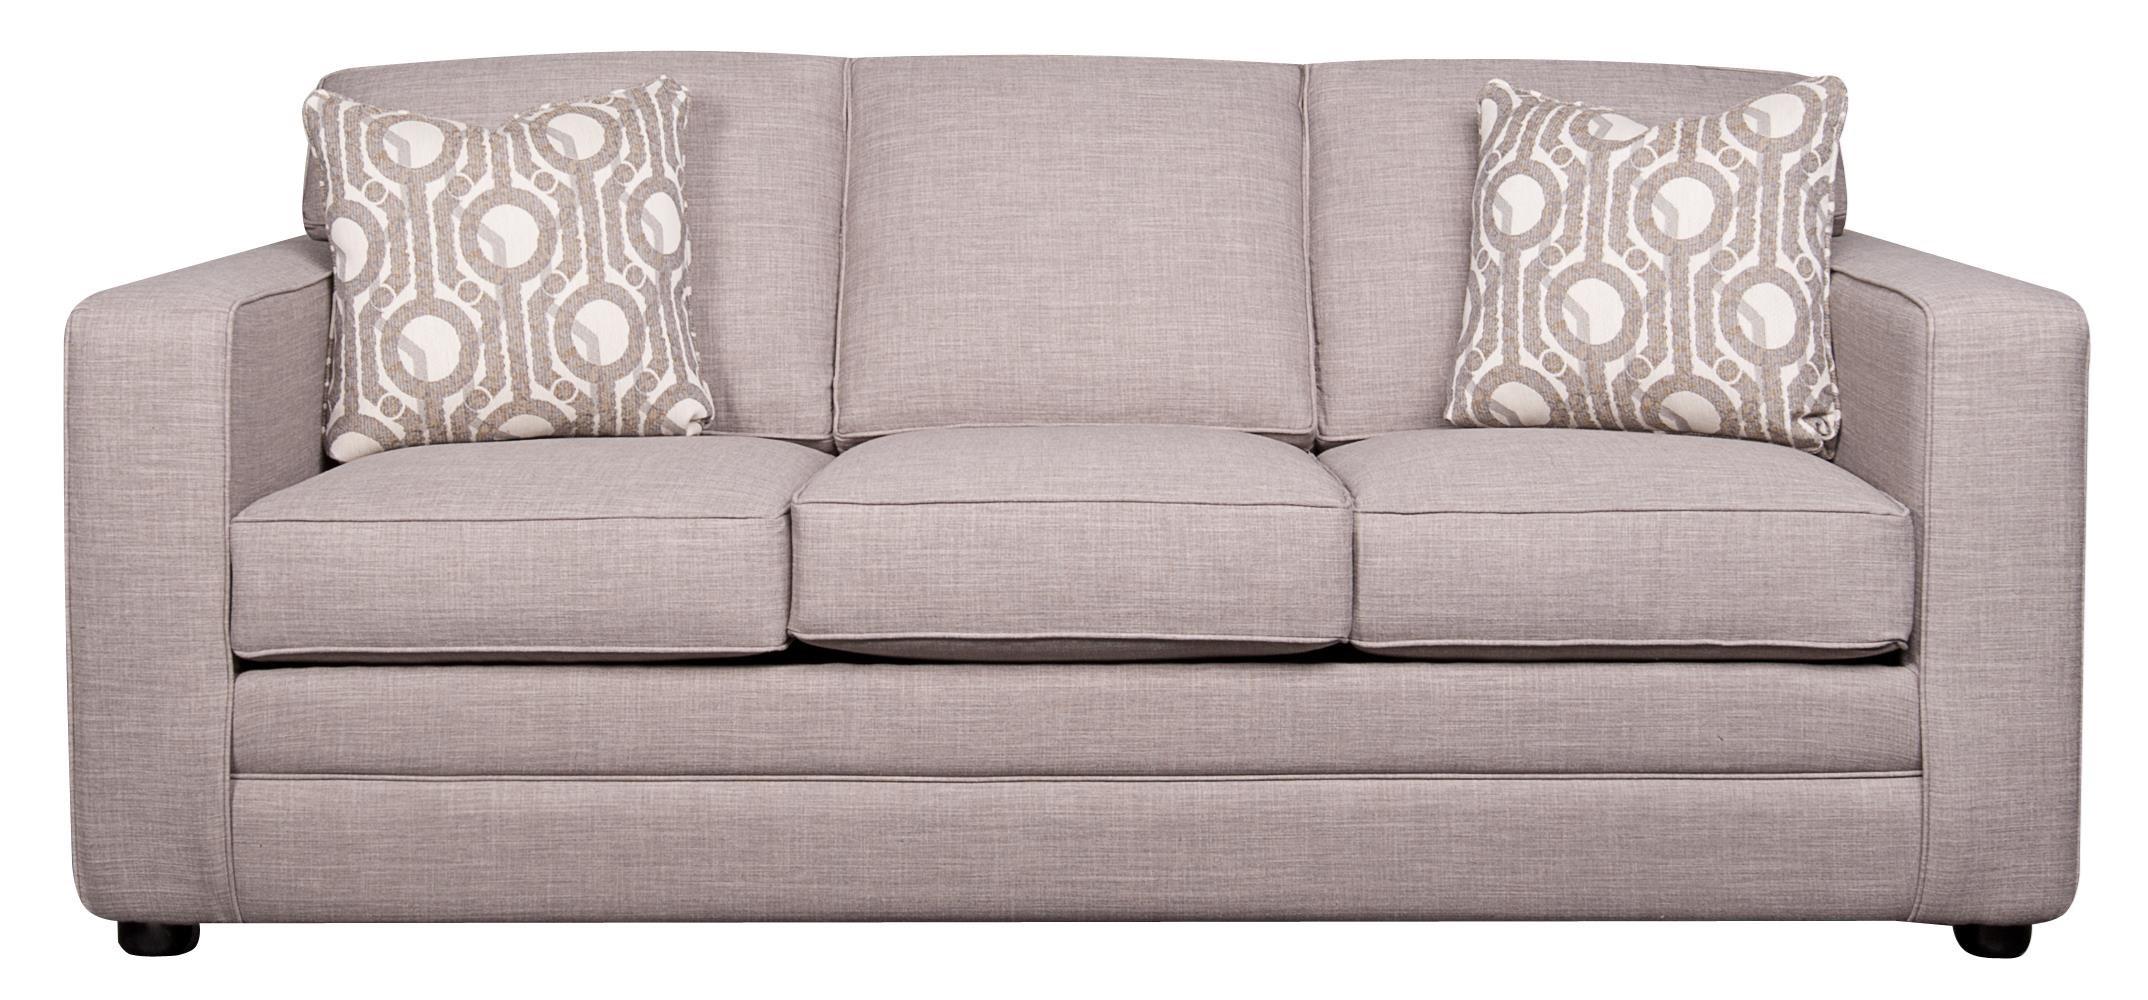 galileo cream microfiber queen sleeper sofa sofas kijiji nl talentneeds